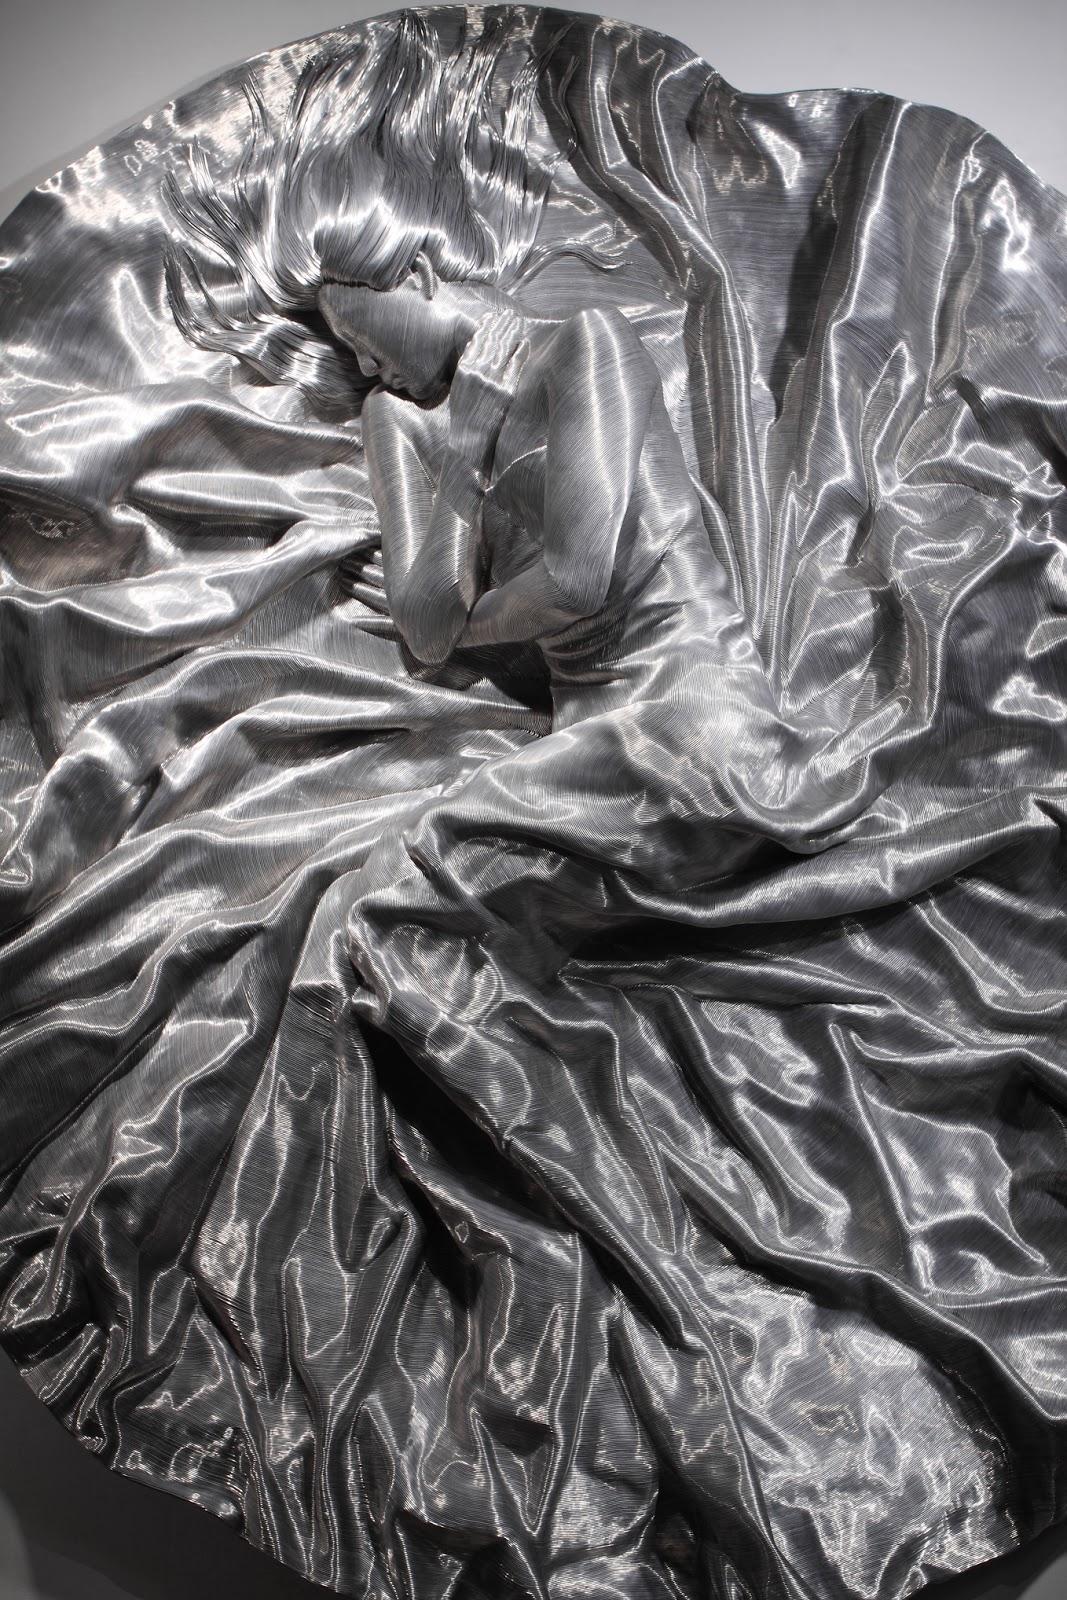 04-Park-Seung-Mo-South-Korean-Artist-&-Sculptor-Wire-Sculpture-www-designstack-co